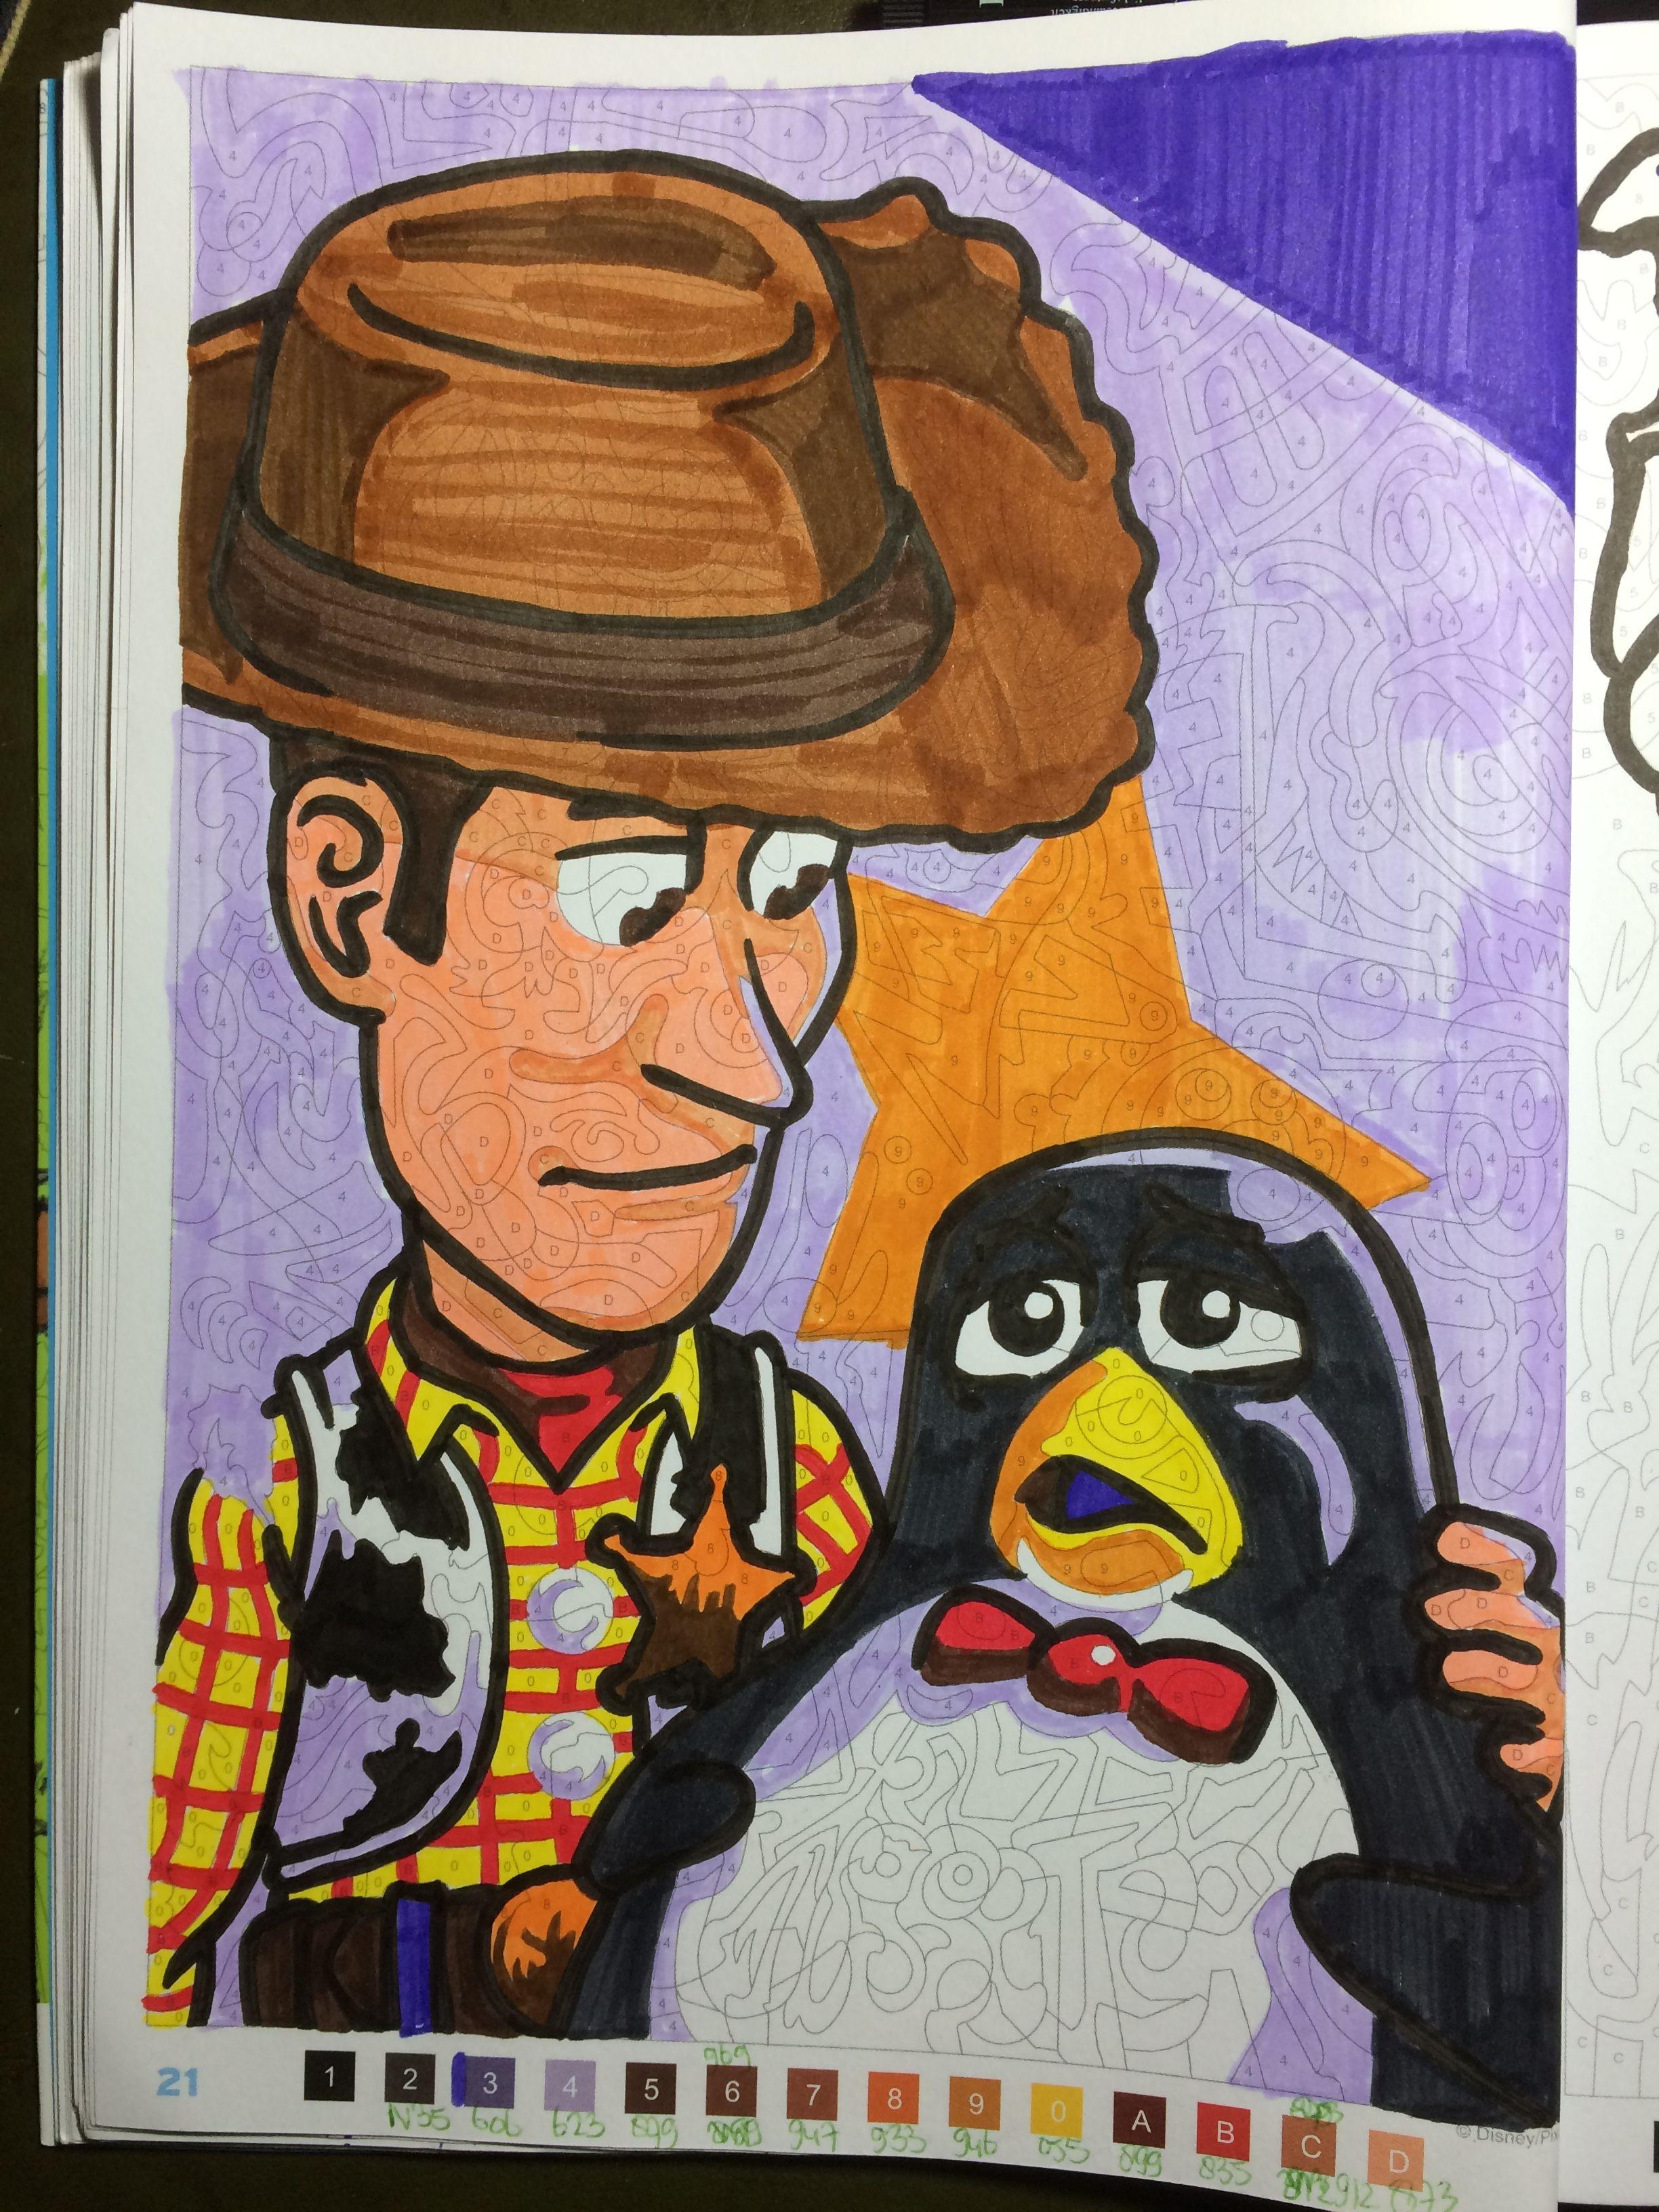 Les grands classiques Disney  Coloriage mystere disney, Disney